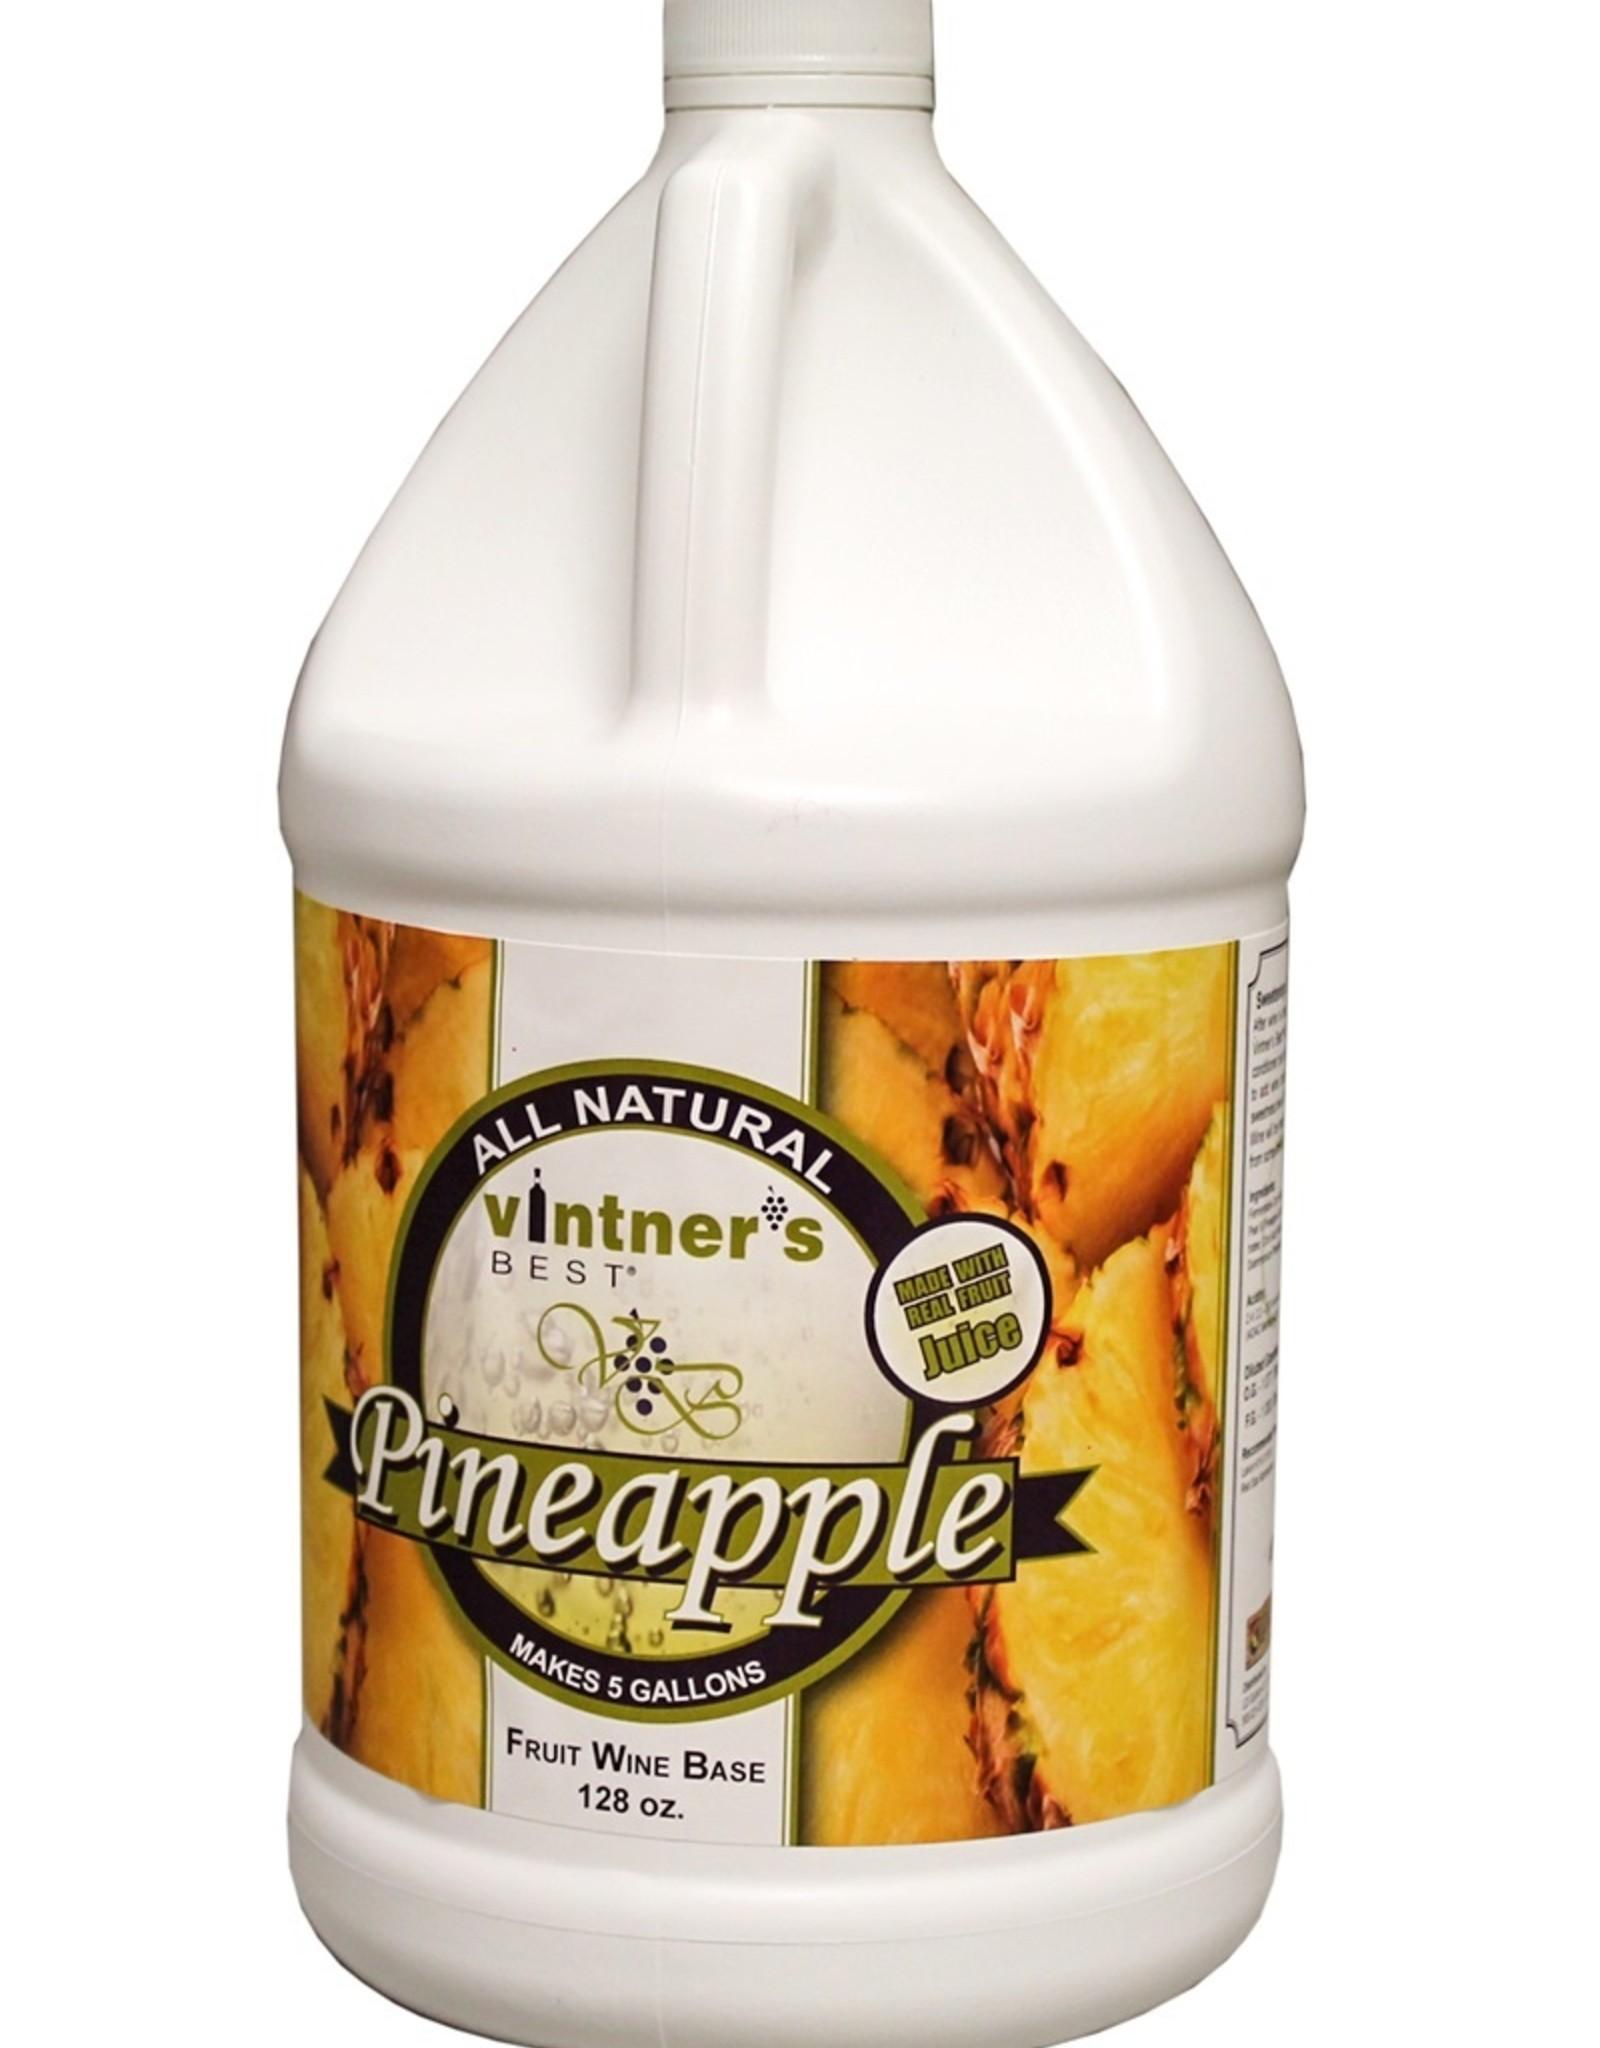 PINEAPPLE FRUIT WINE BASE 128 OZ (1 GALLON)